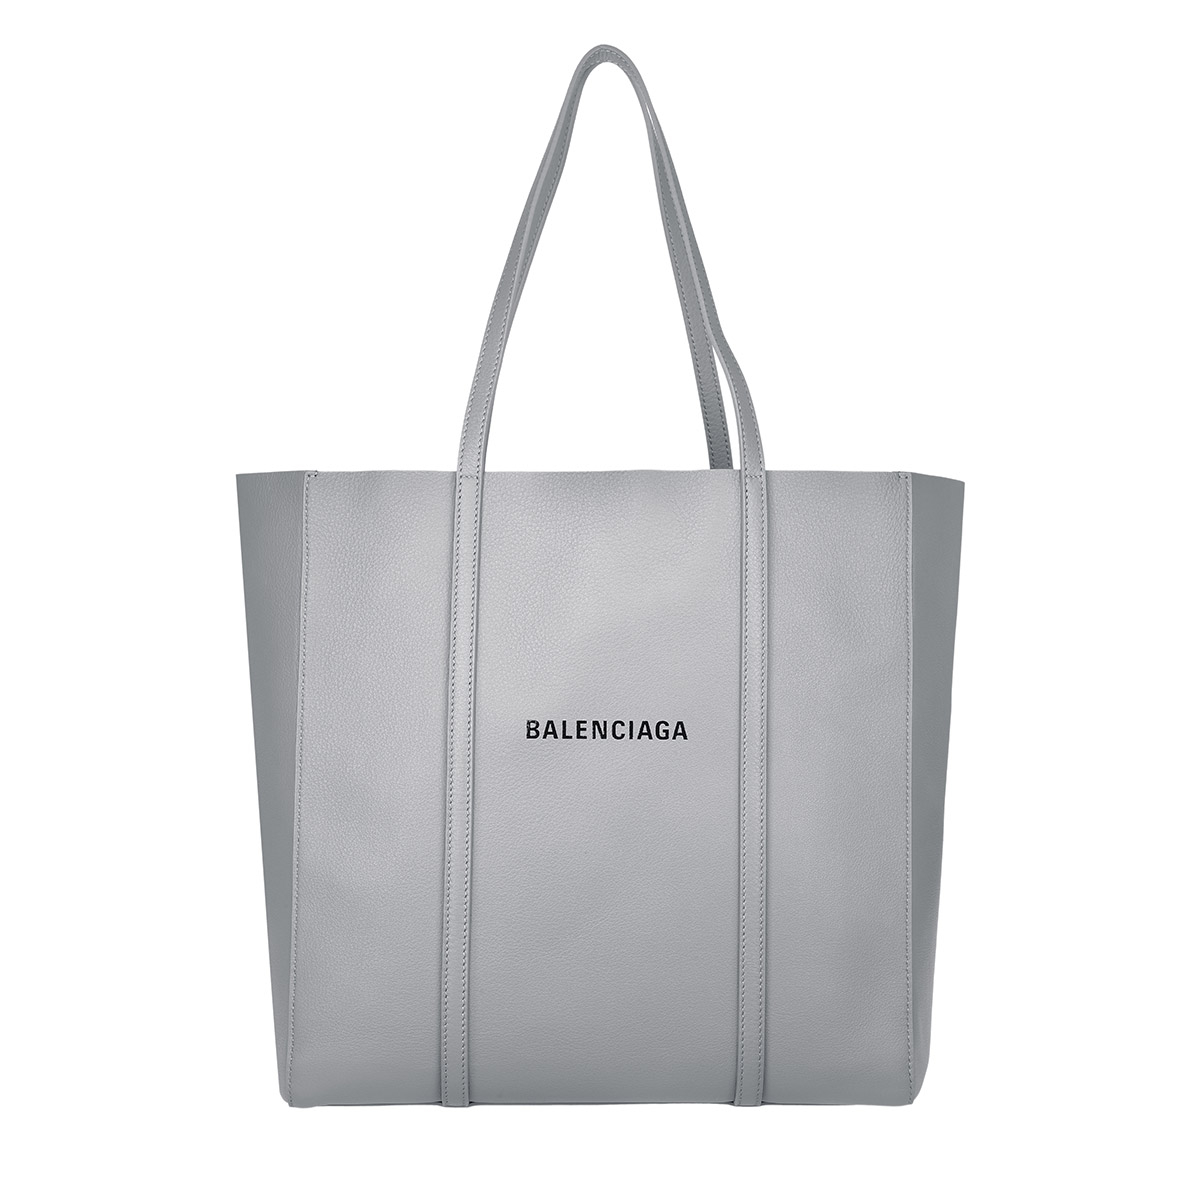 Balenciaga Tote - Everyday Tote S Leather Grey/Black - in grau - für Damen